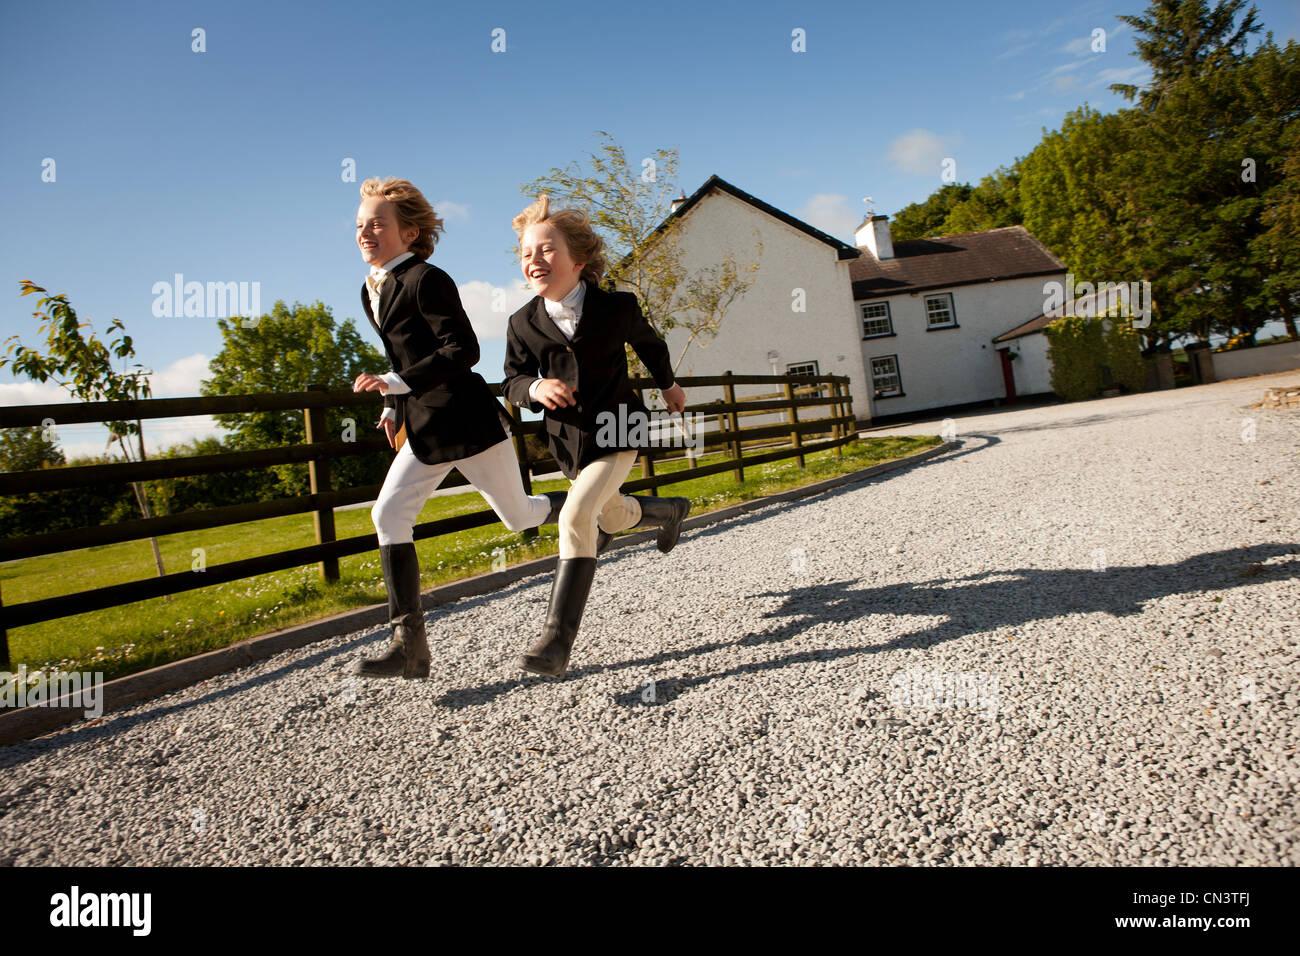 Boys running along gravel path of ranch - Stock Image